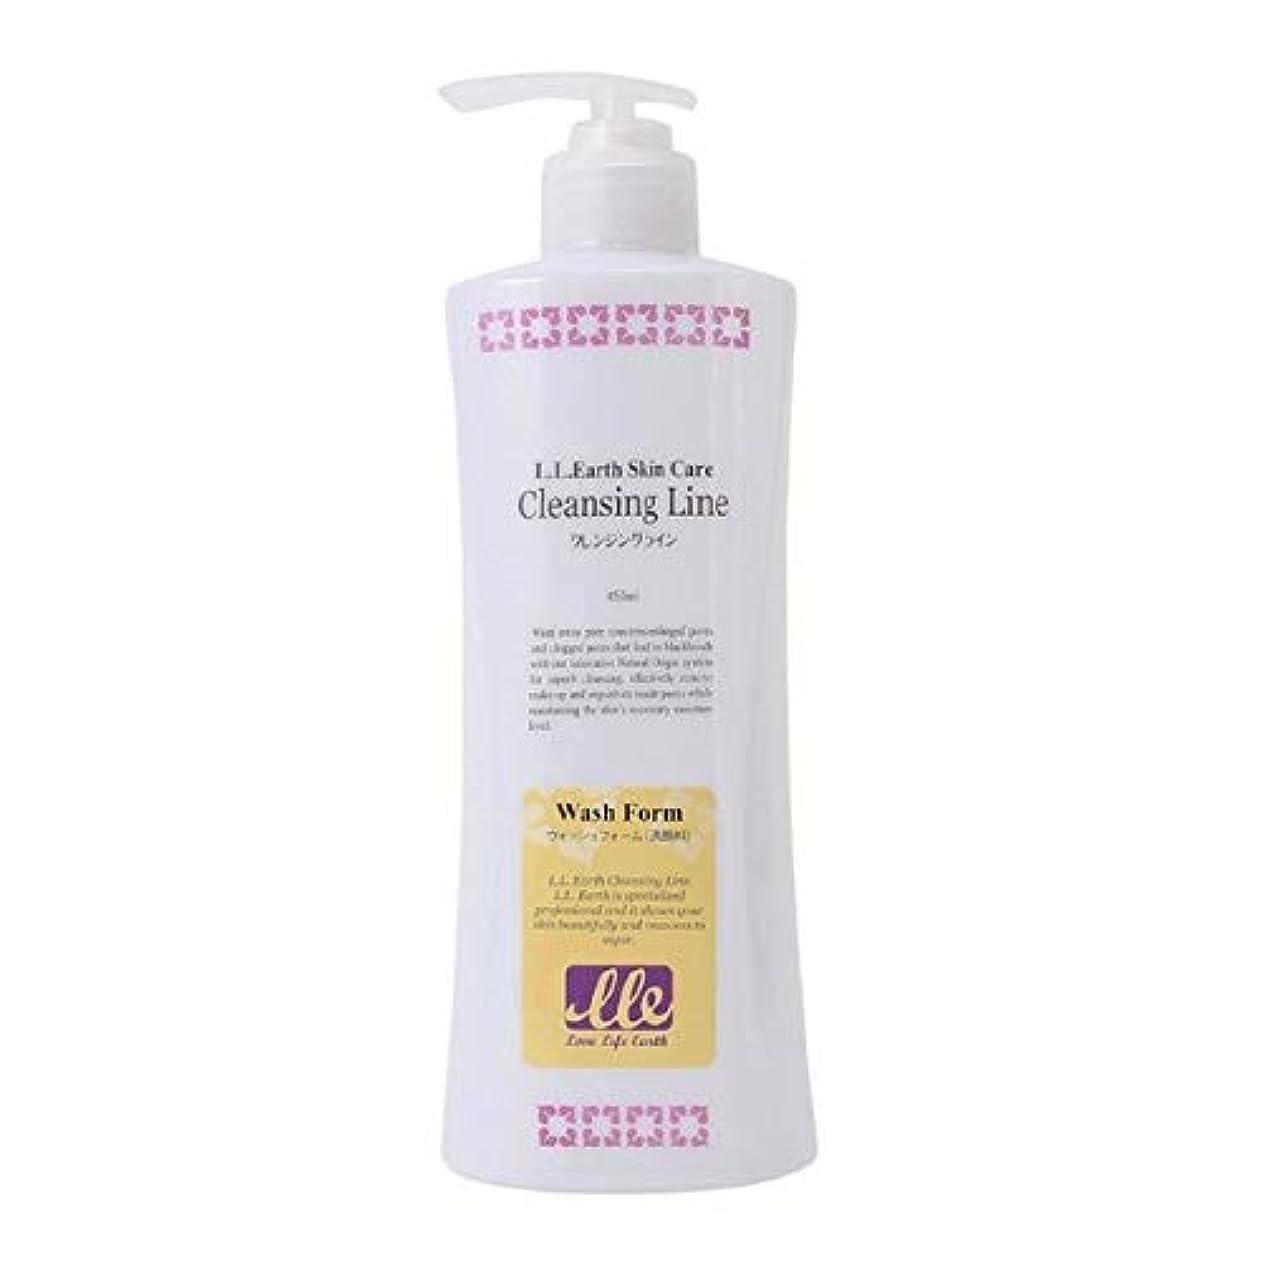 LLE ウォッシュフォーム 業務用 450ml 洗顔 洗顔料 クリームタイプ アロエベラ